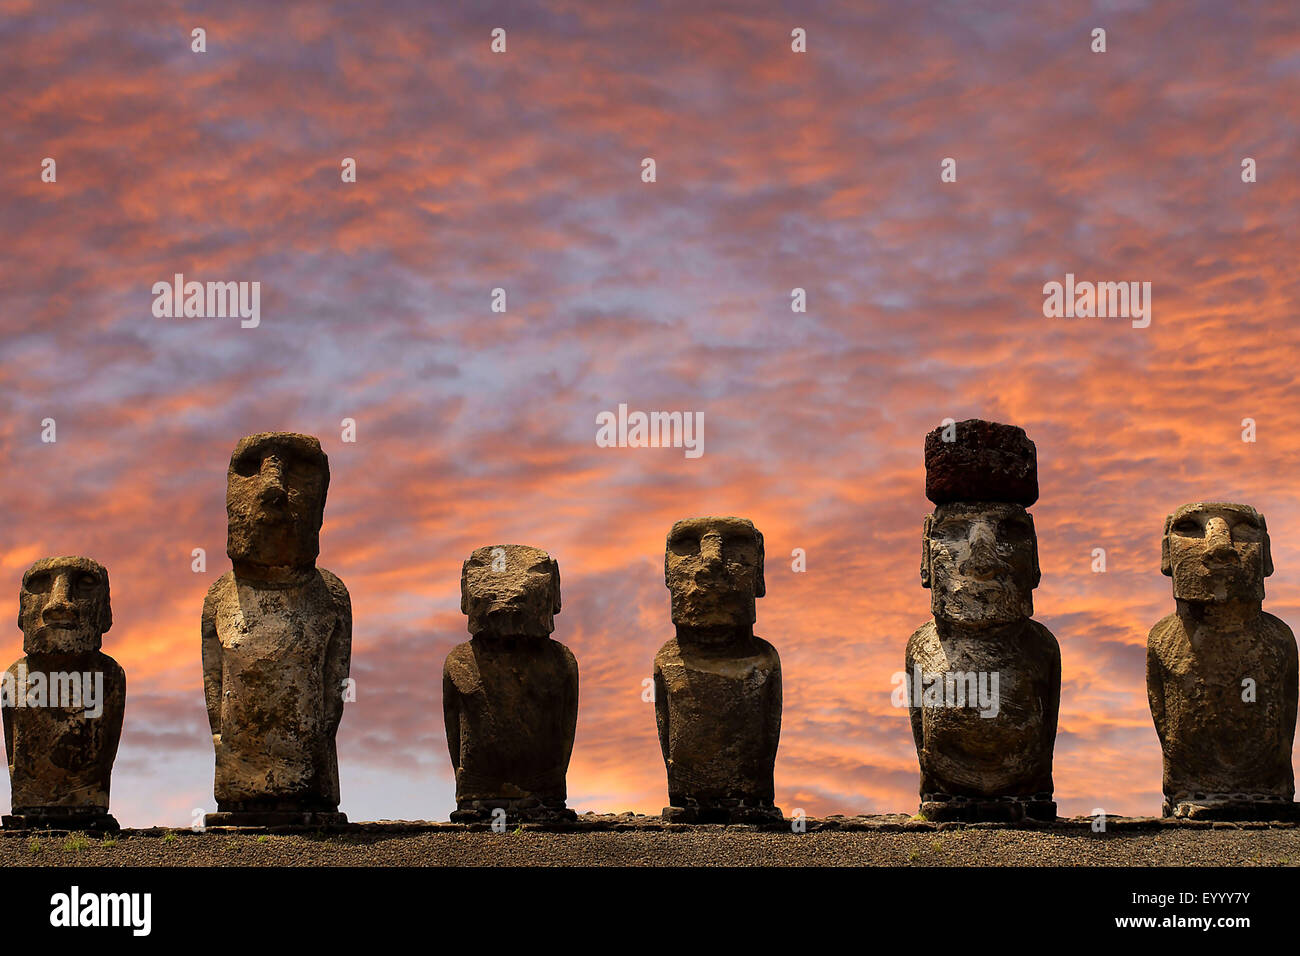 Estatuas Moái en Sunset, Chile, el Parque Nacional Rapa Nui Imagen De Stock